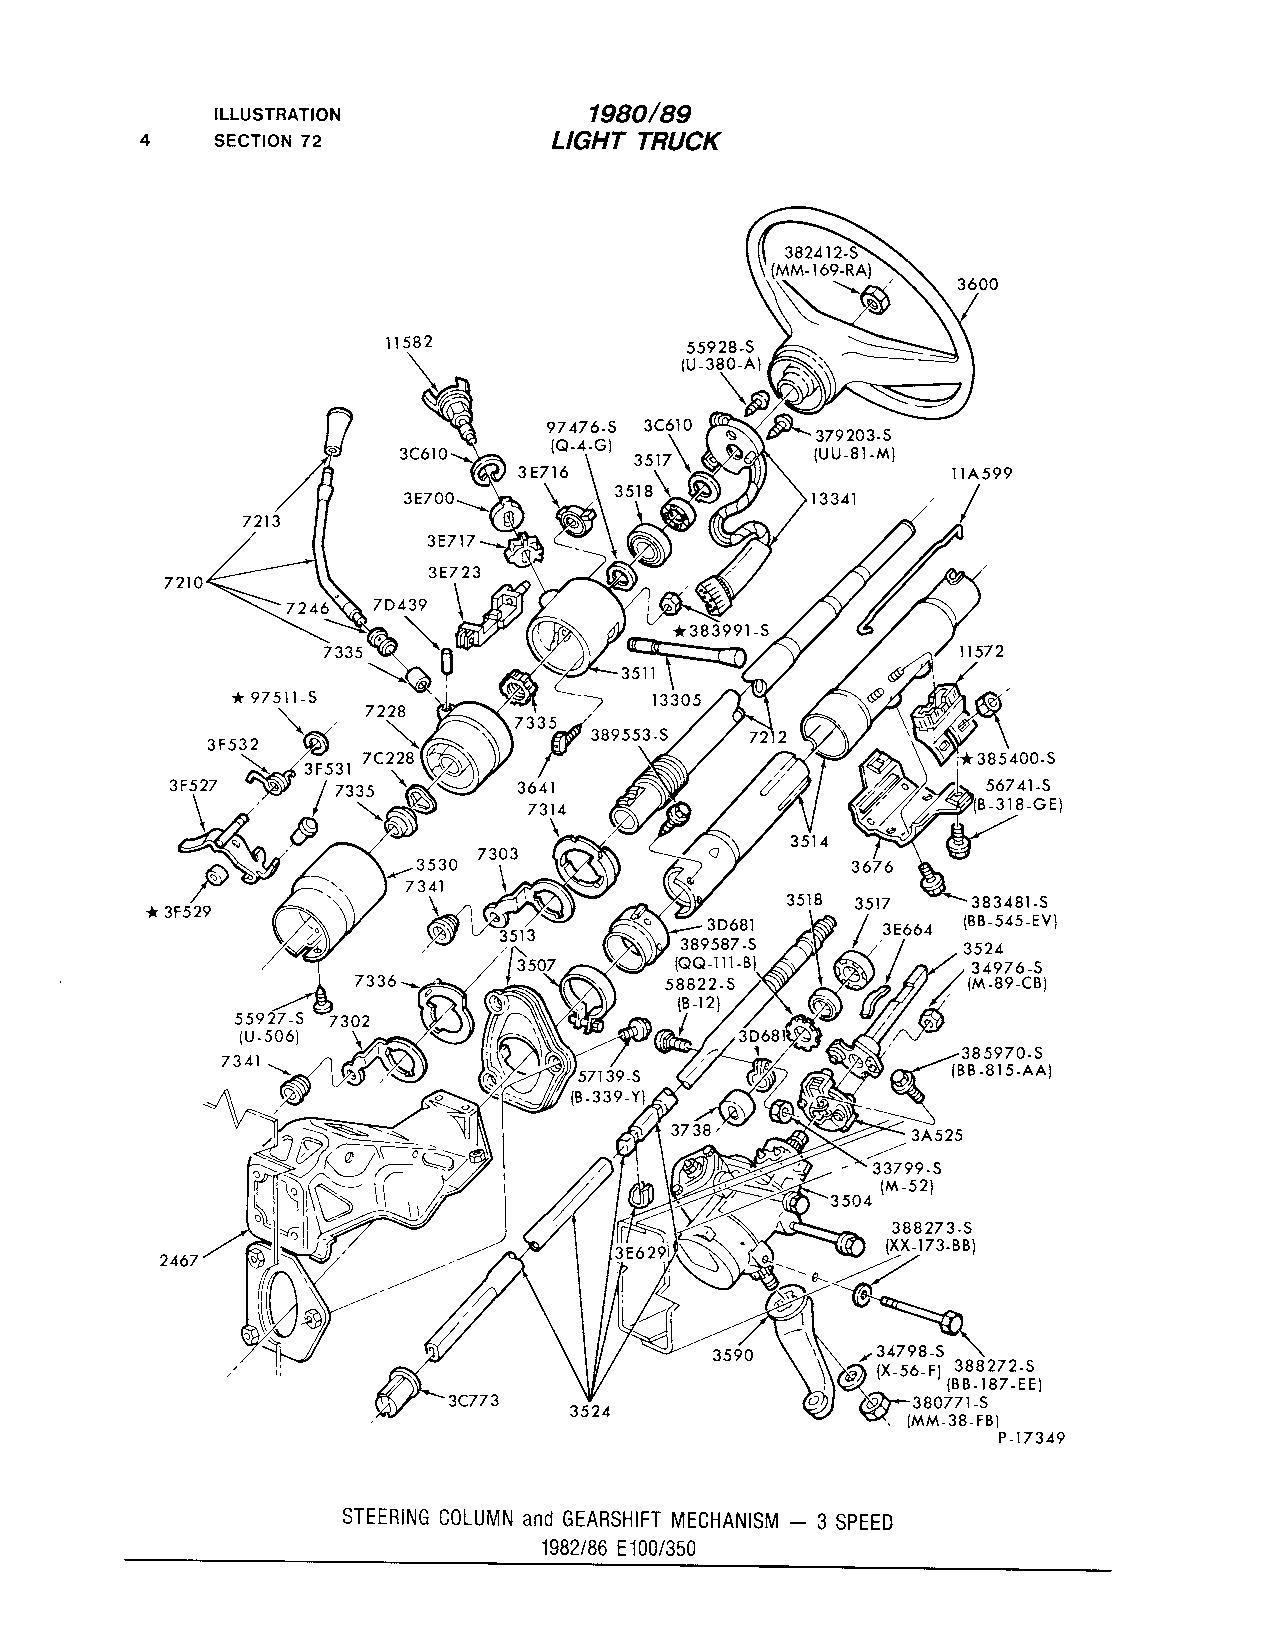 Missing Shifter Mechanism In A 84 E150 3 In A Tree